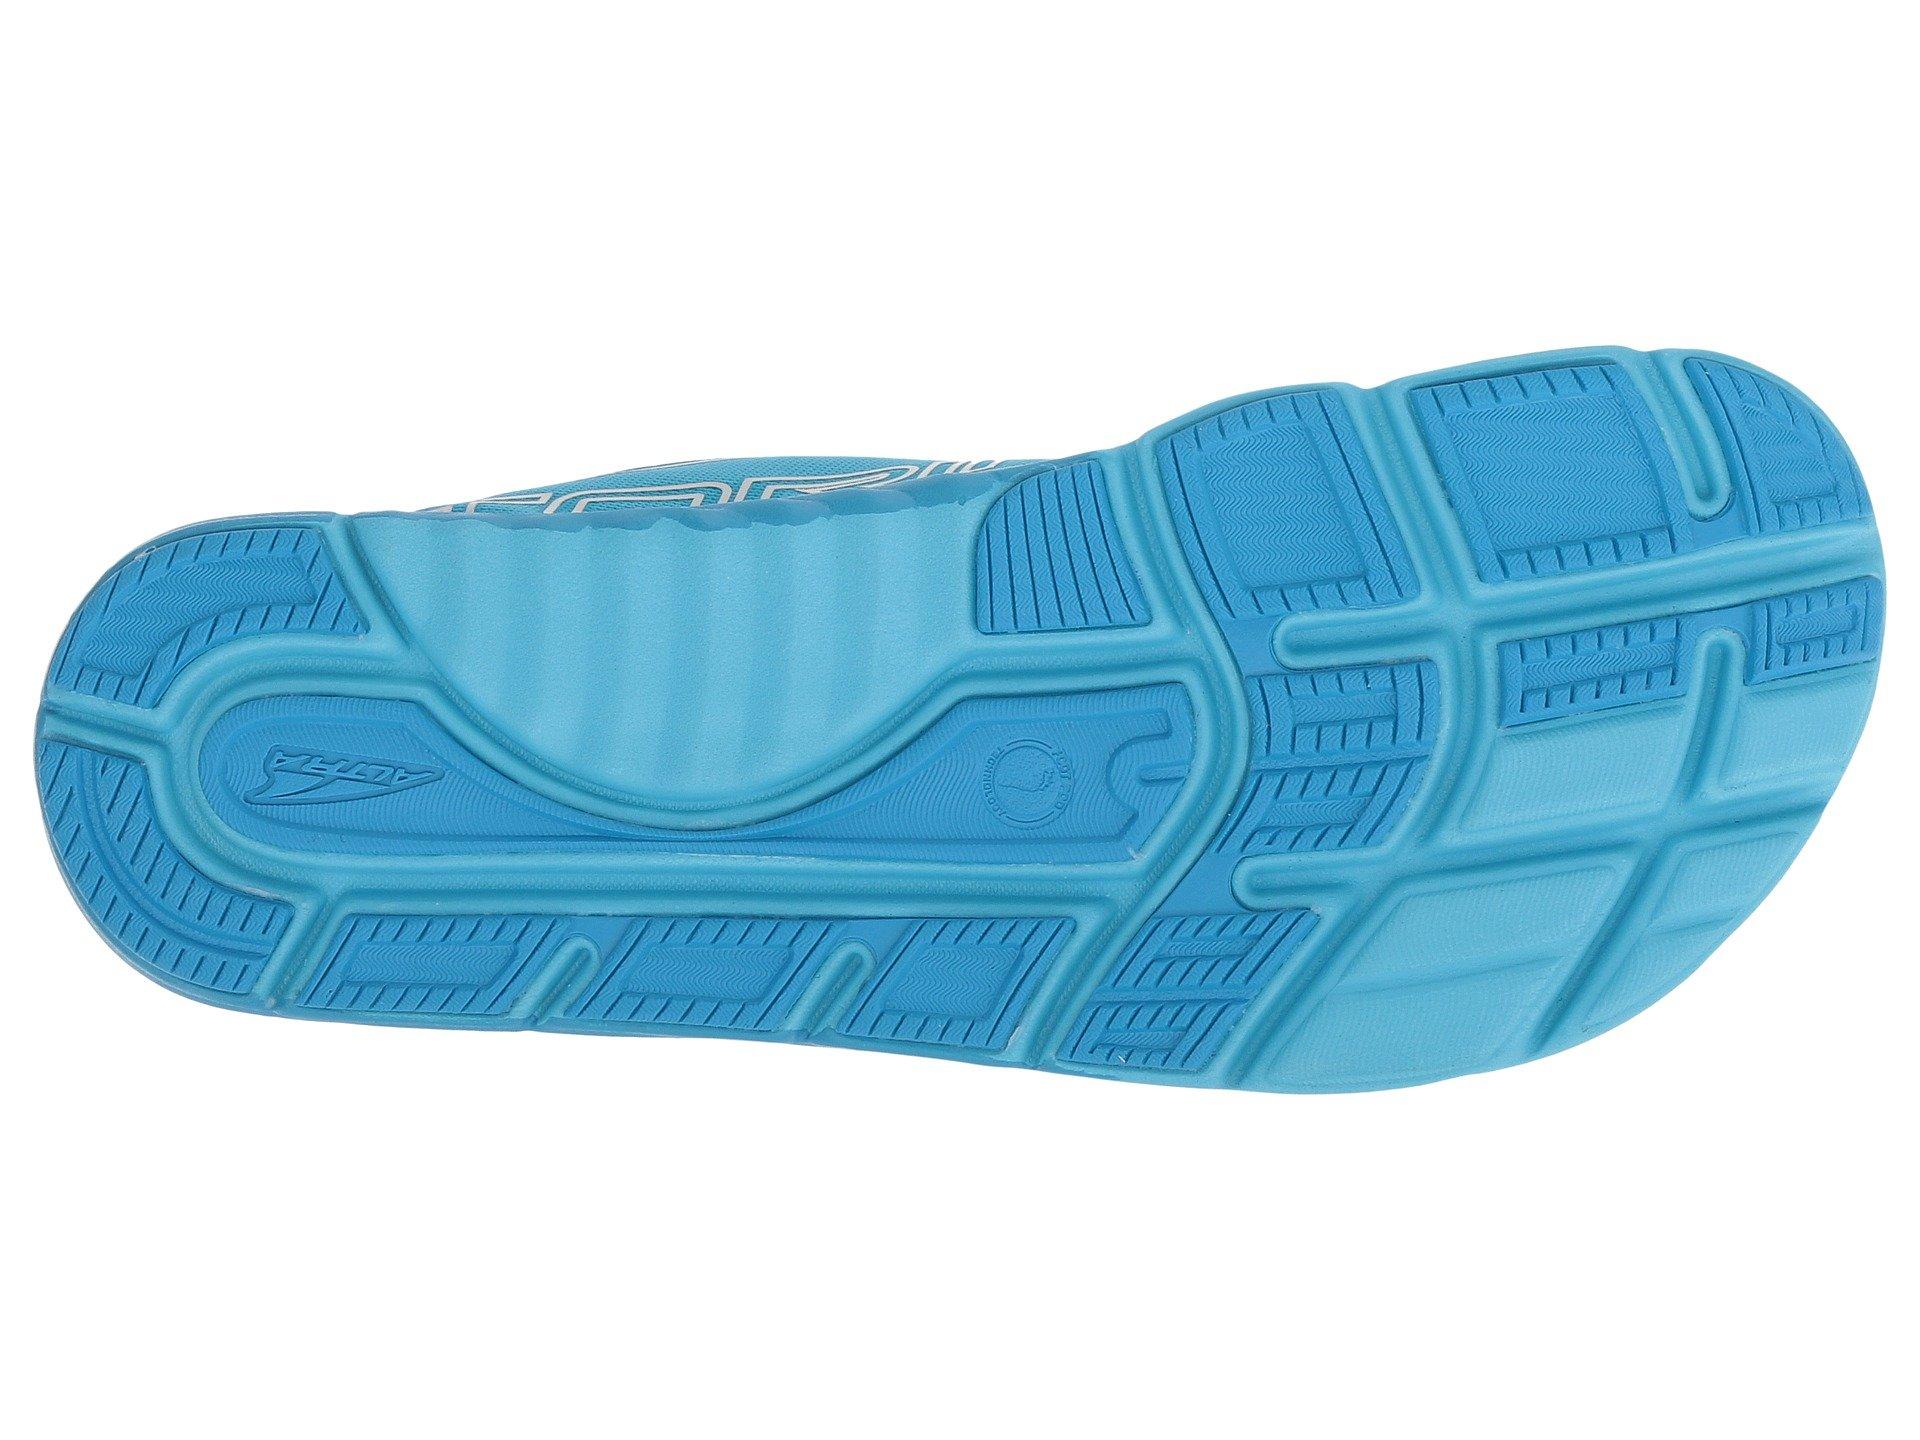 Altra Donna  Torin Torin Torin 3.5 Zero Drop Comfort Athletic Running scarpe blu b2d4ac